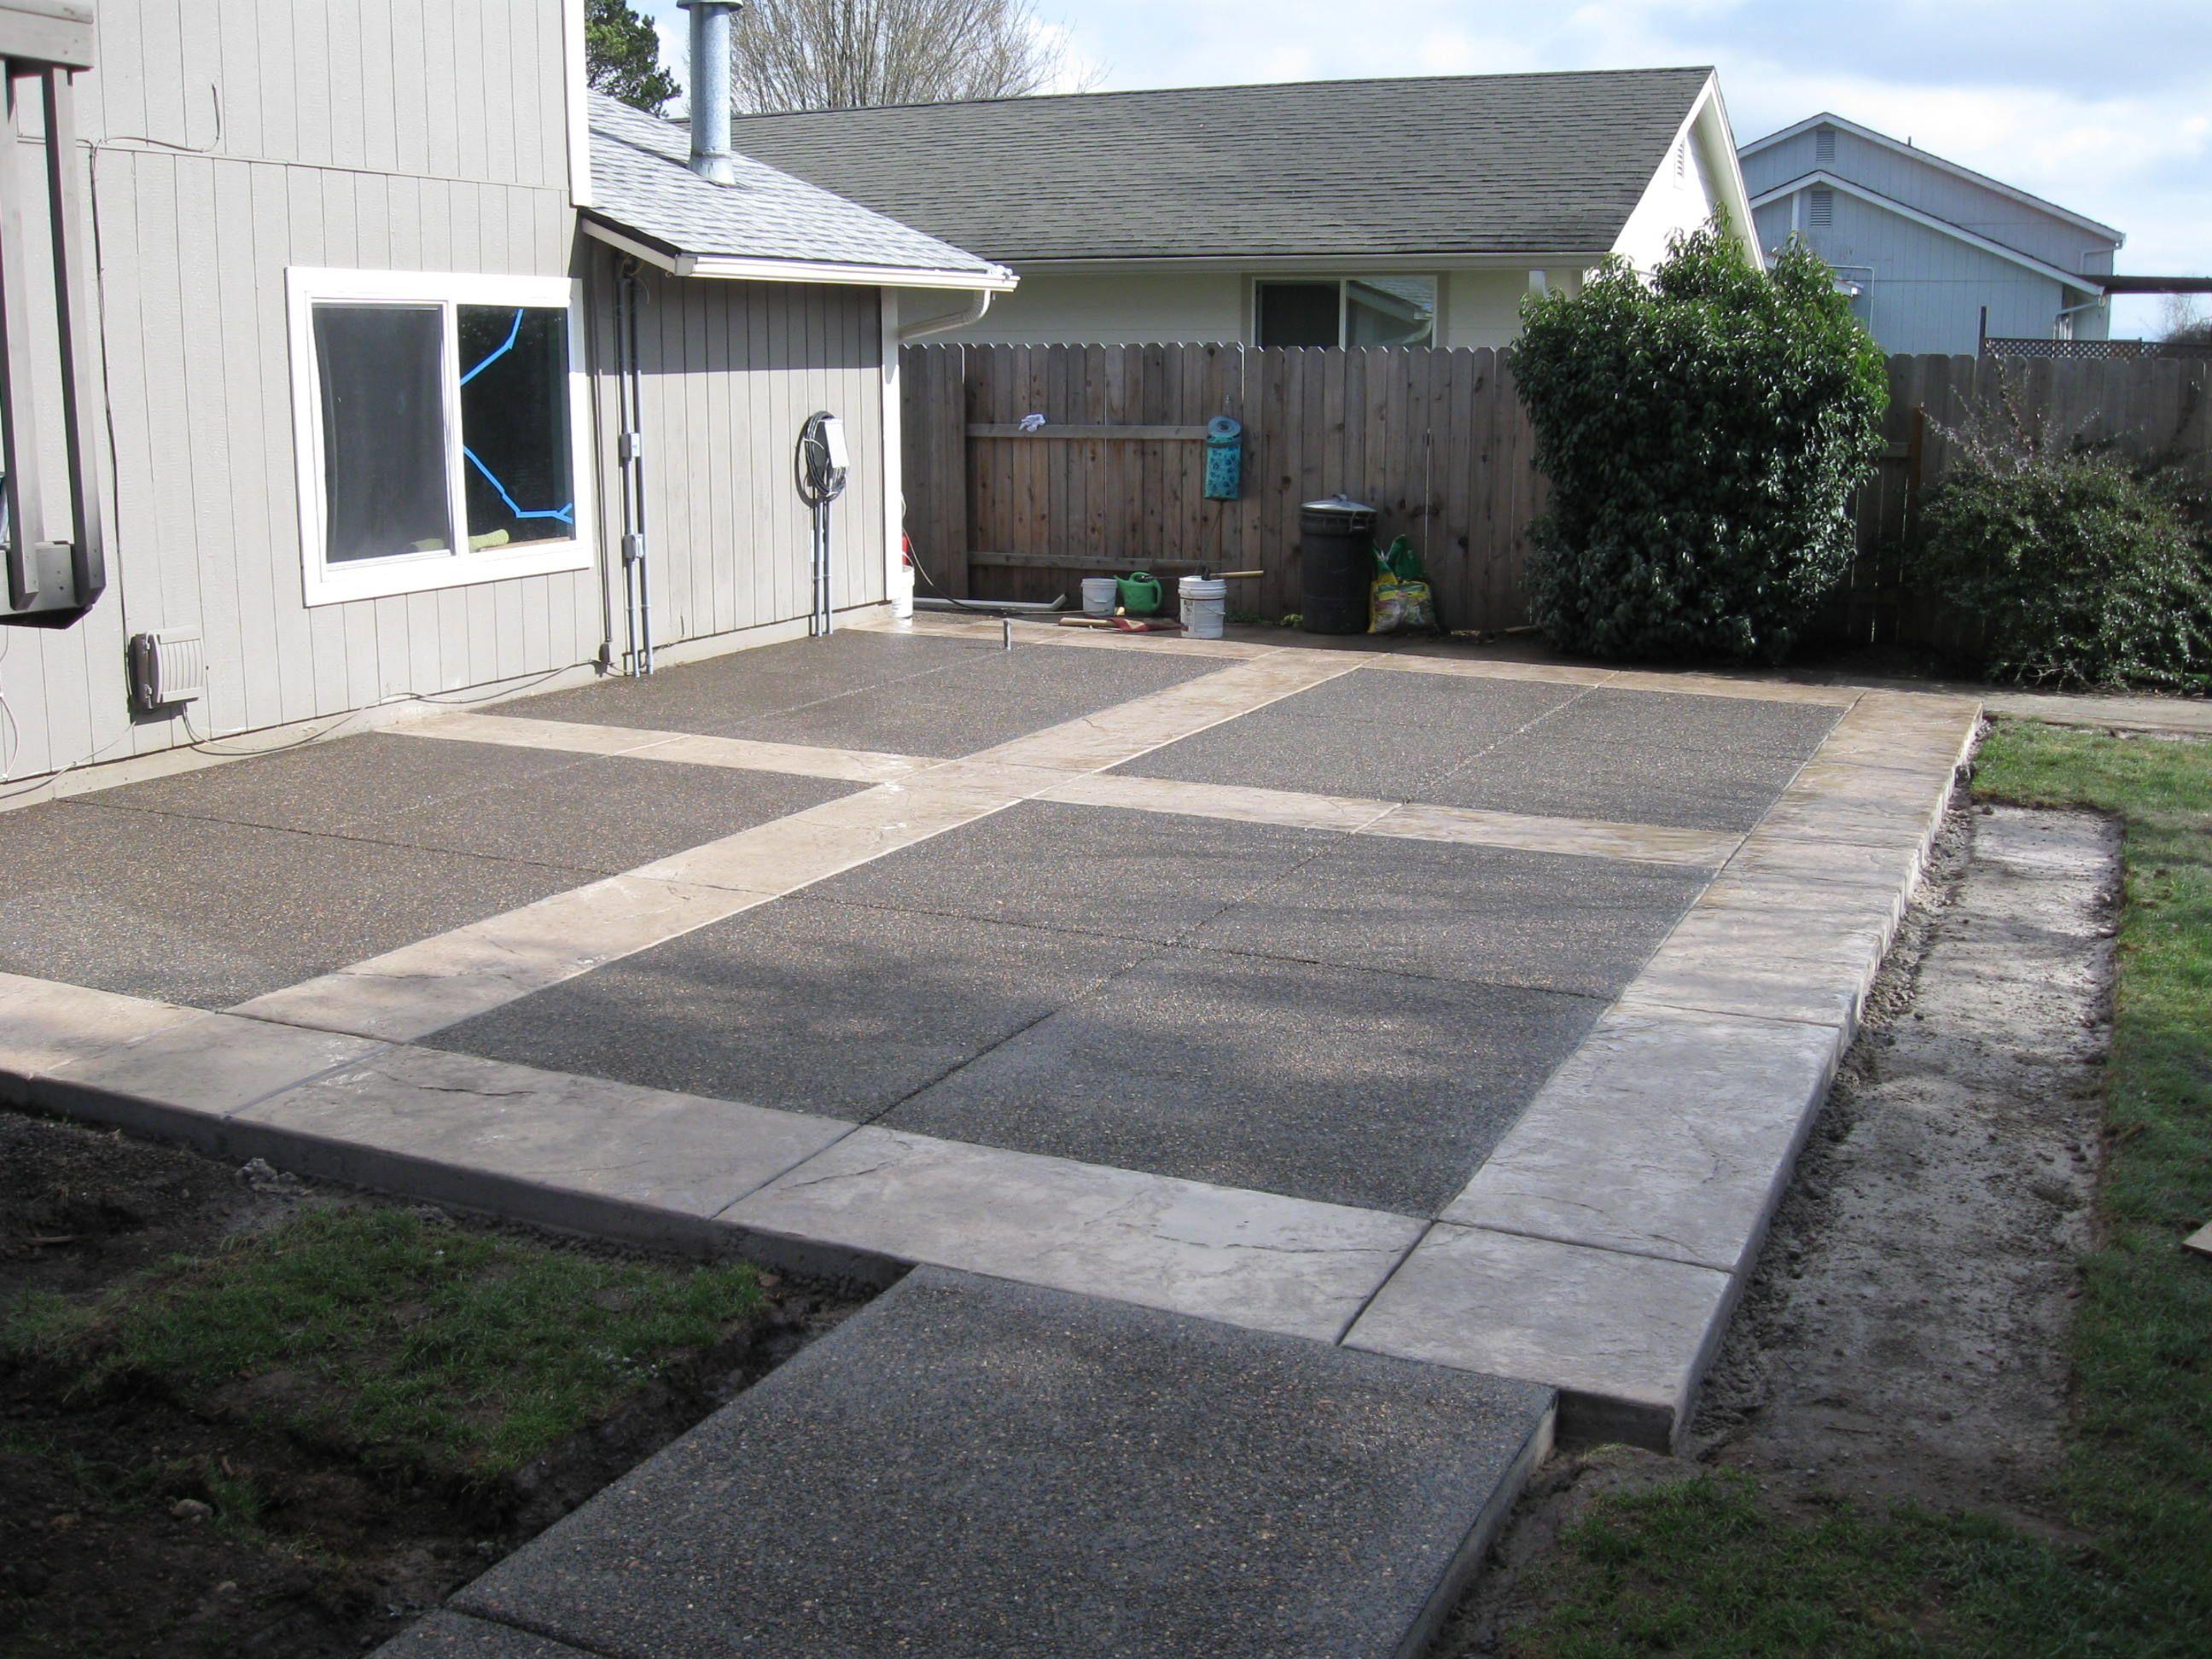 Concrete Patio Design Ideas Creating Patios Driveways